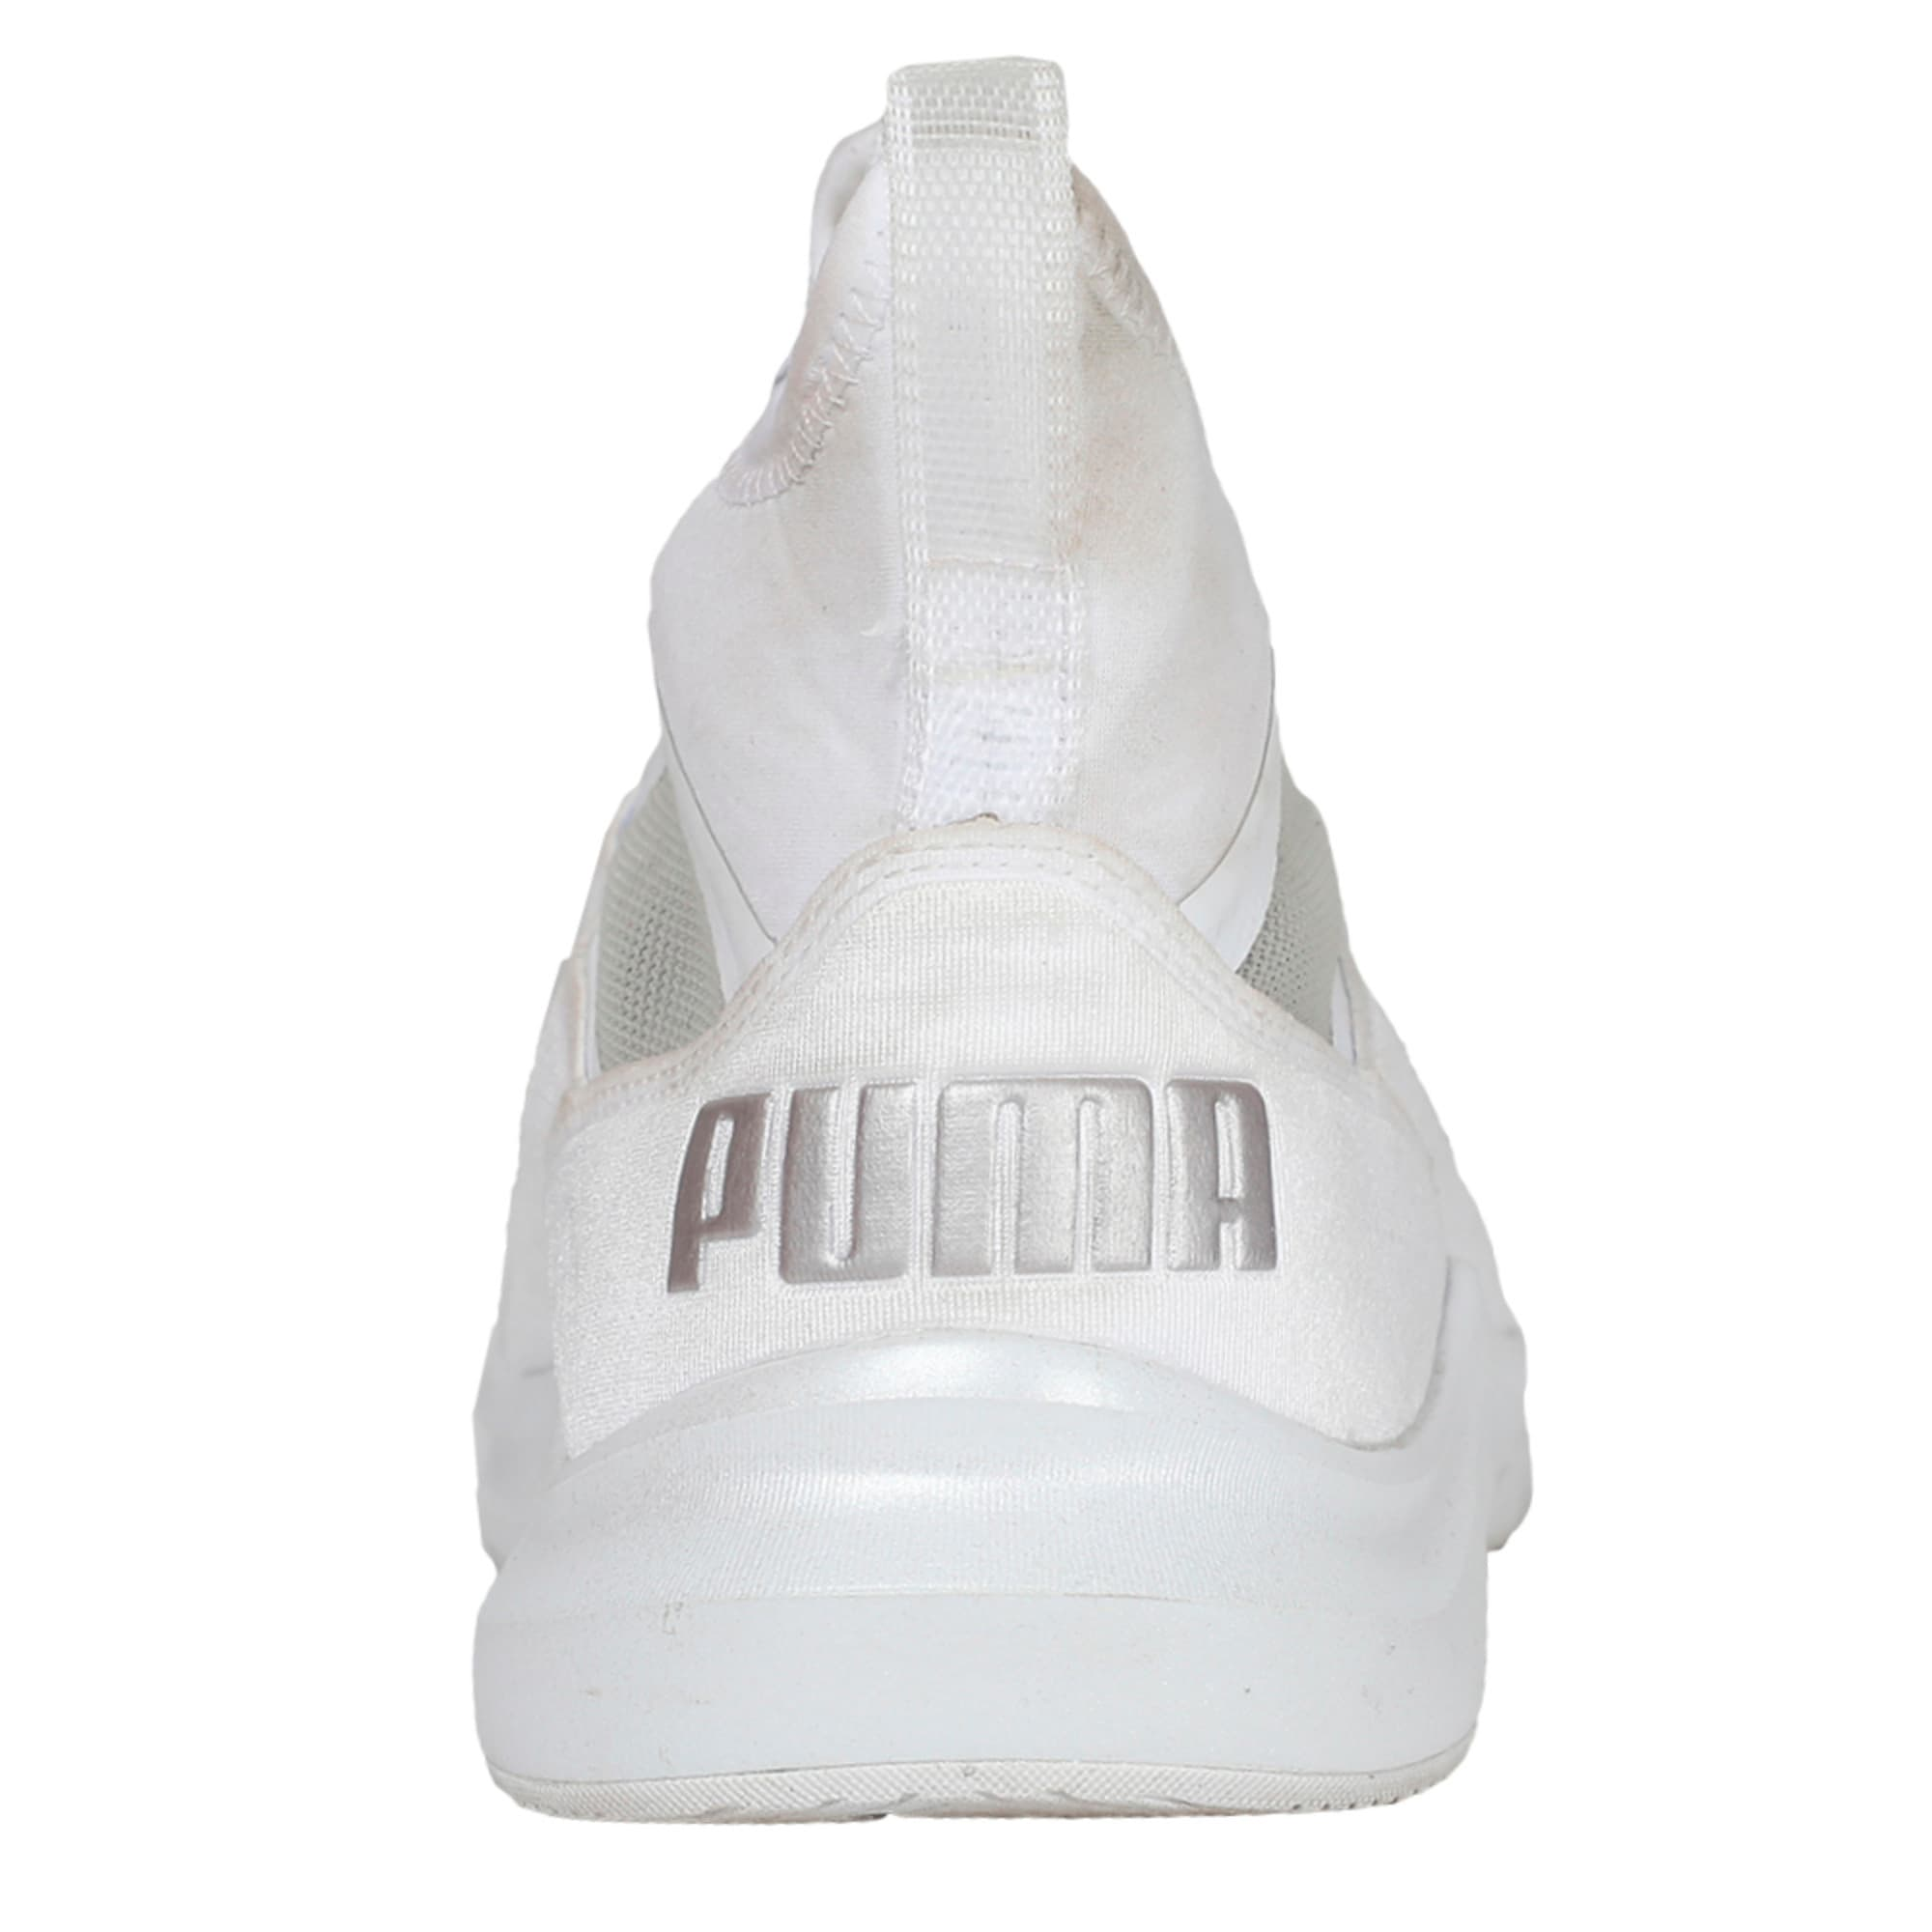 Thumbnail 4 of Phenom En Pointe Women's Training Shoes, Puma White-Metallic Beige, medium-IND